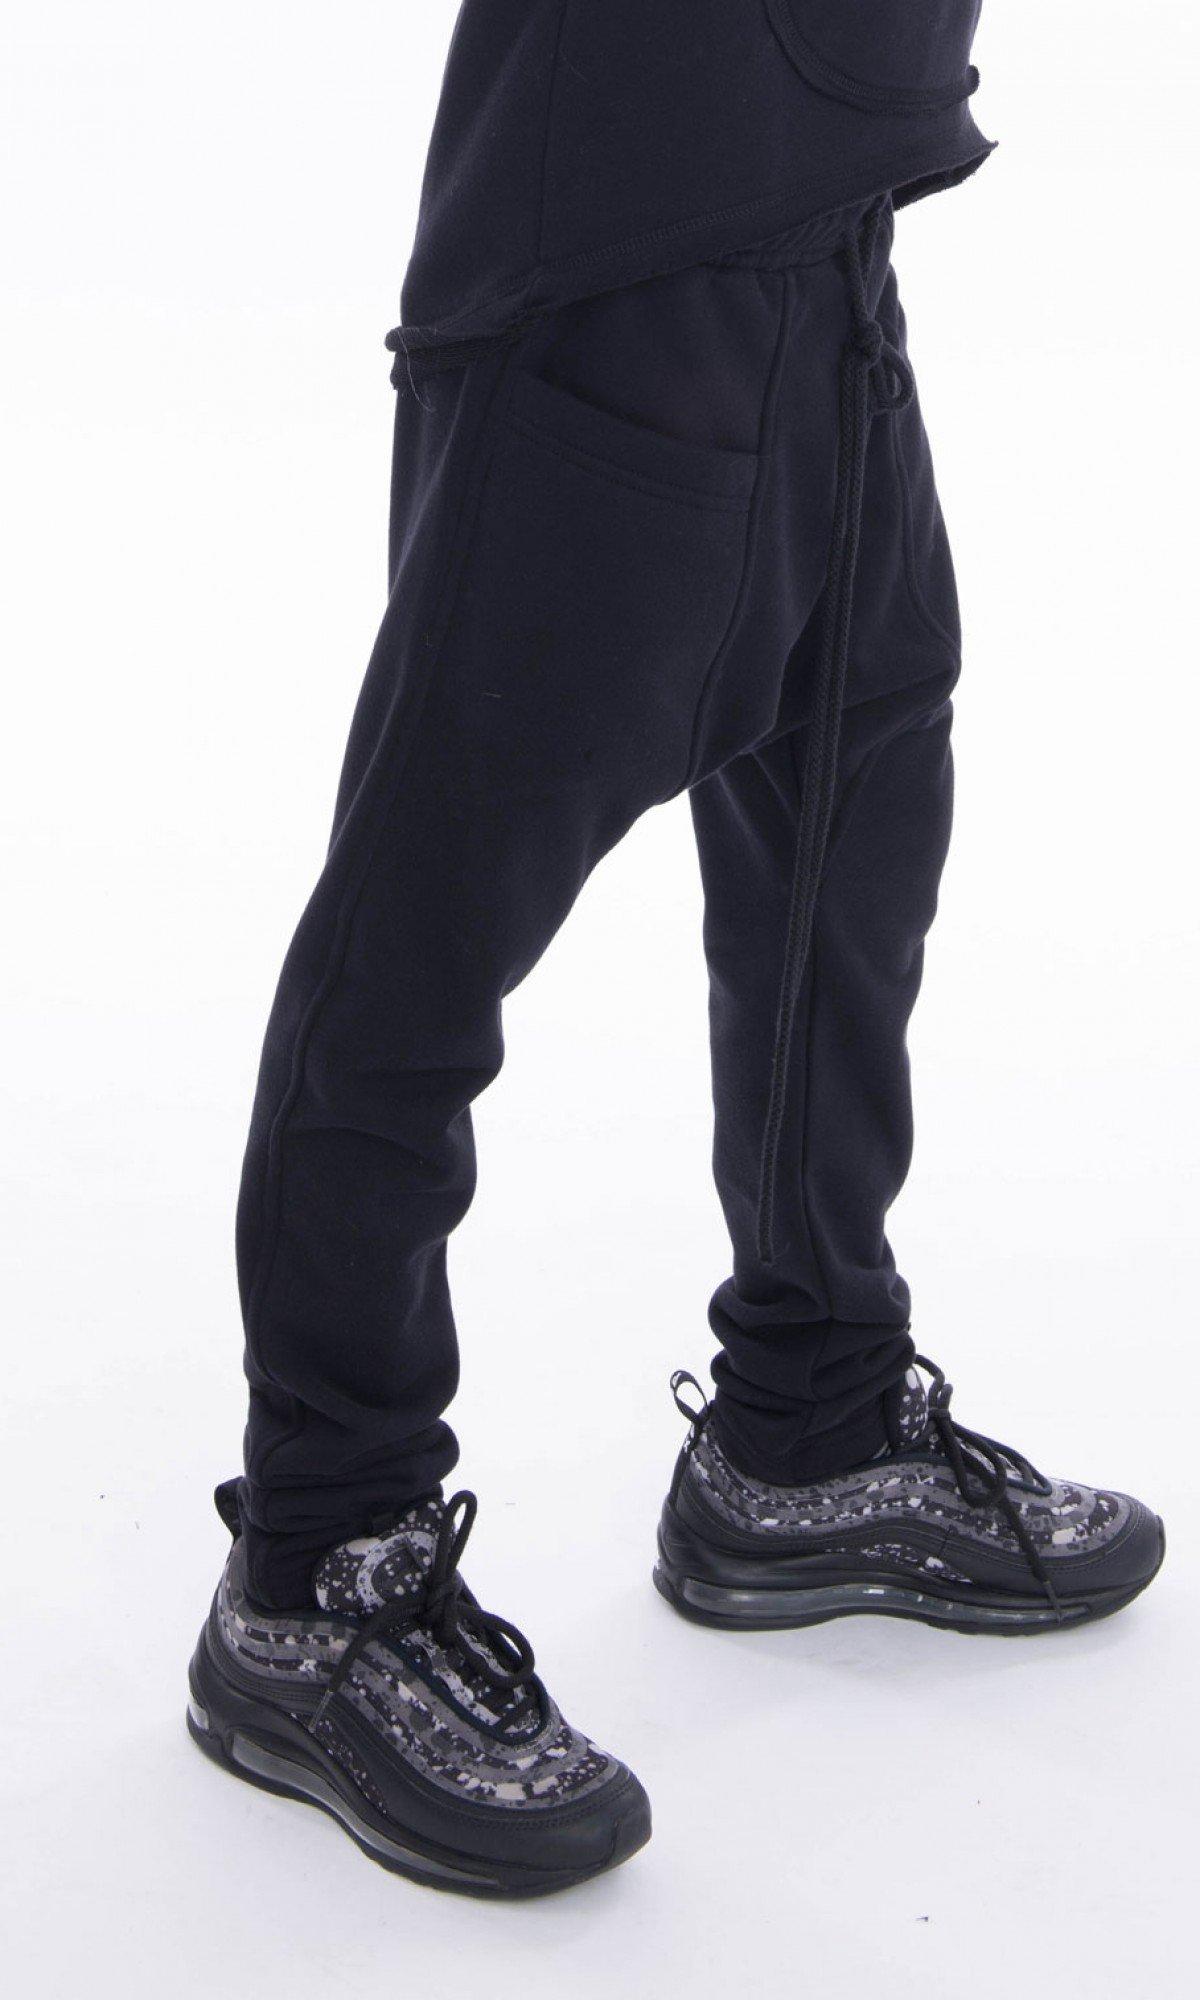 Long drop crotch pants with big front pockets A90388C